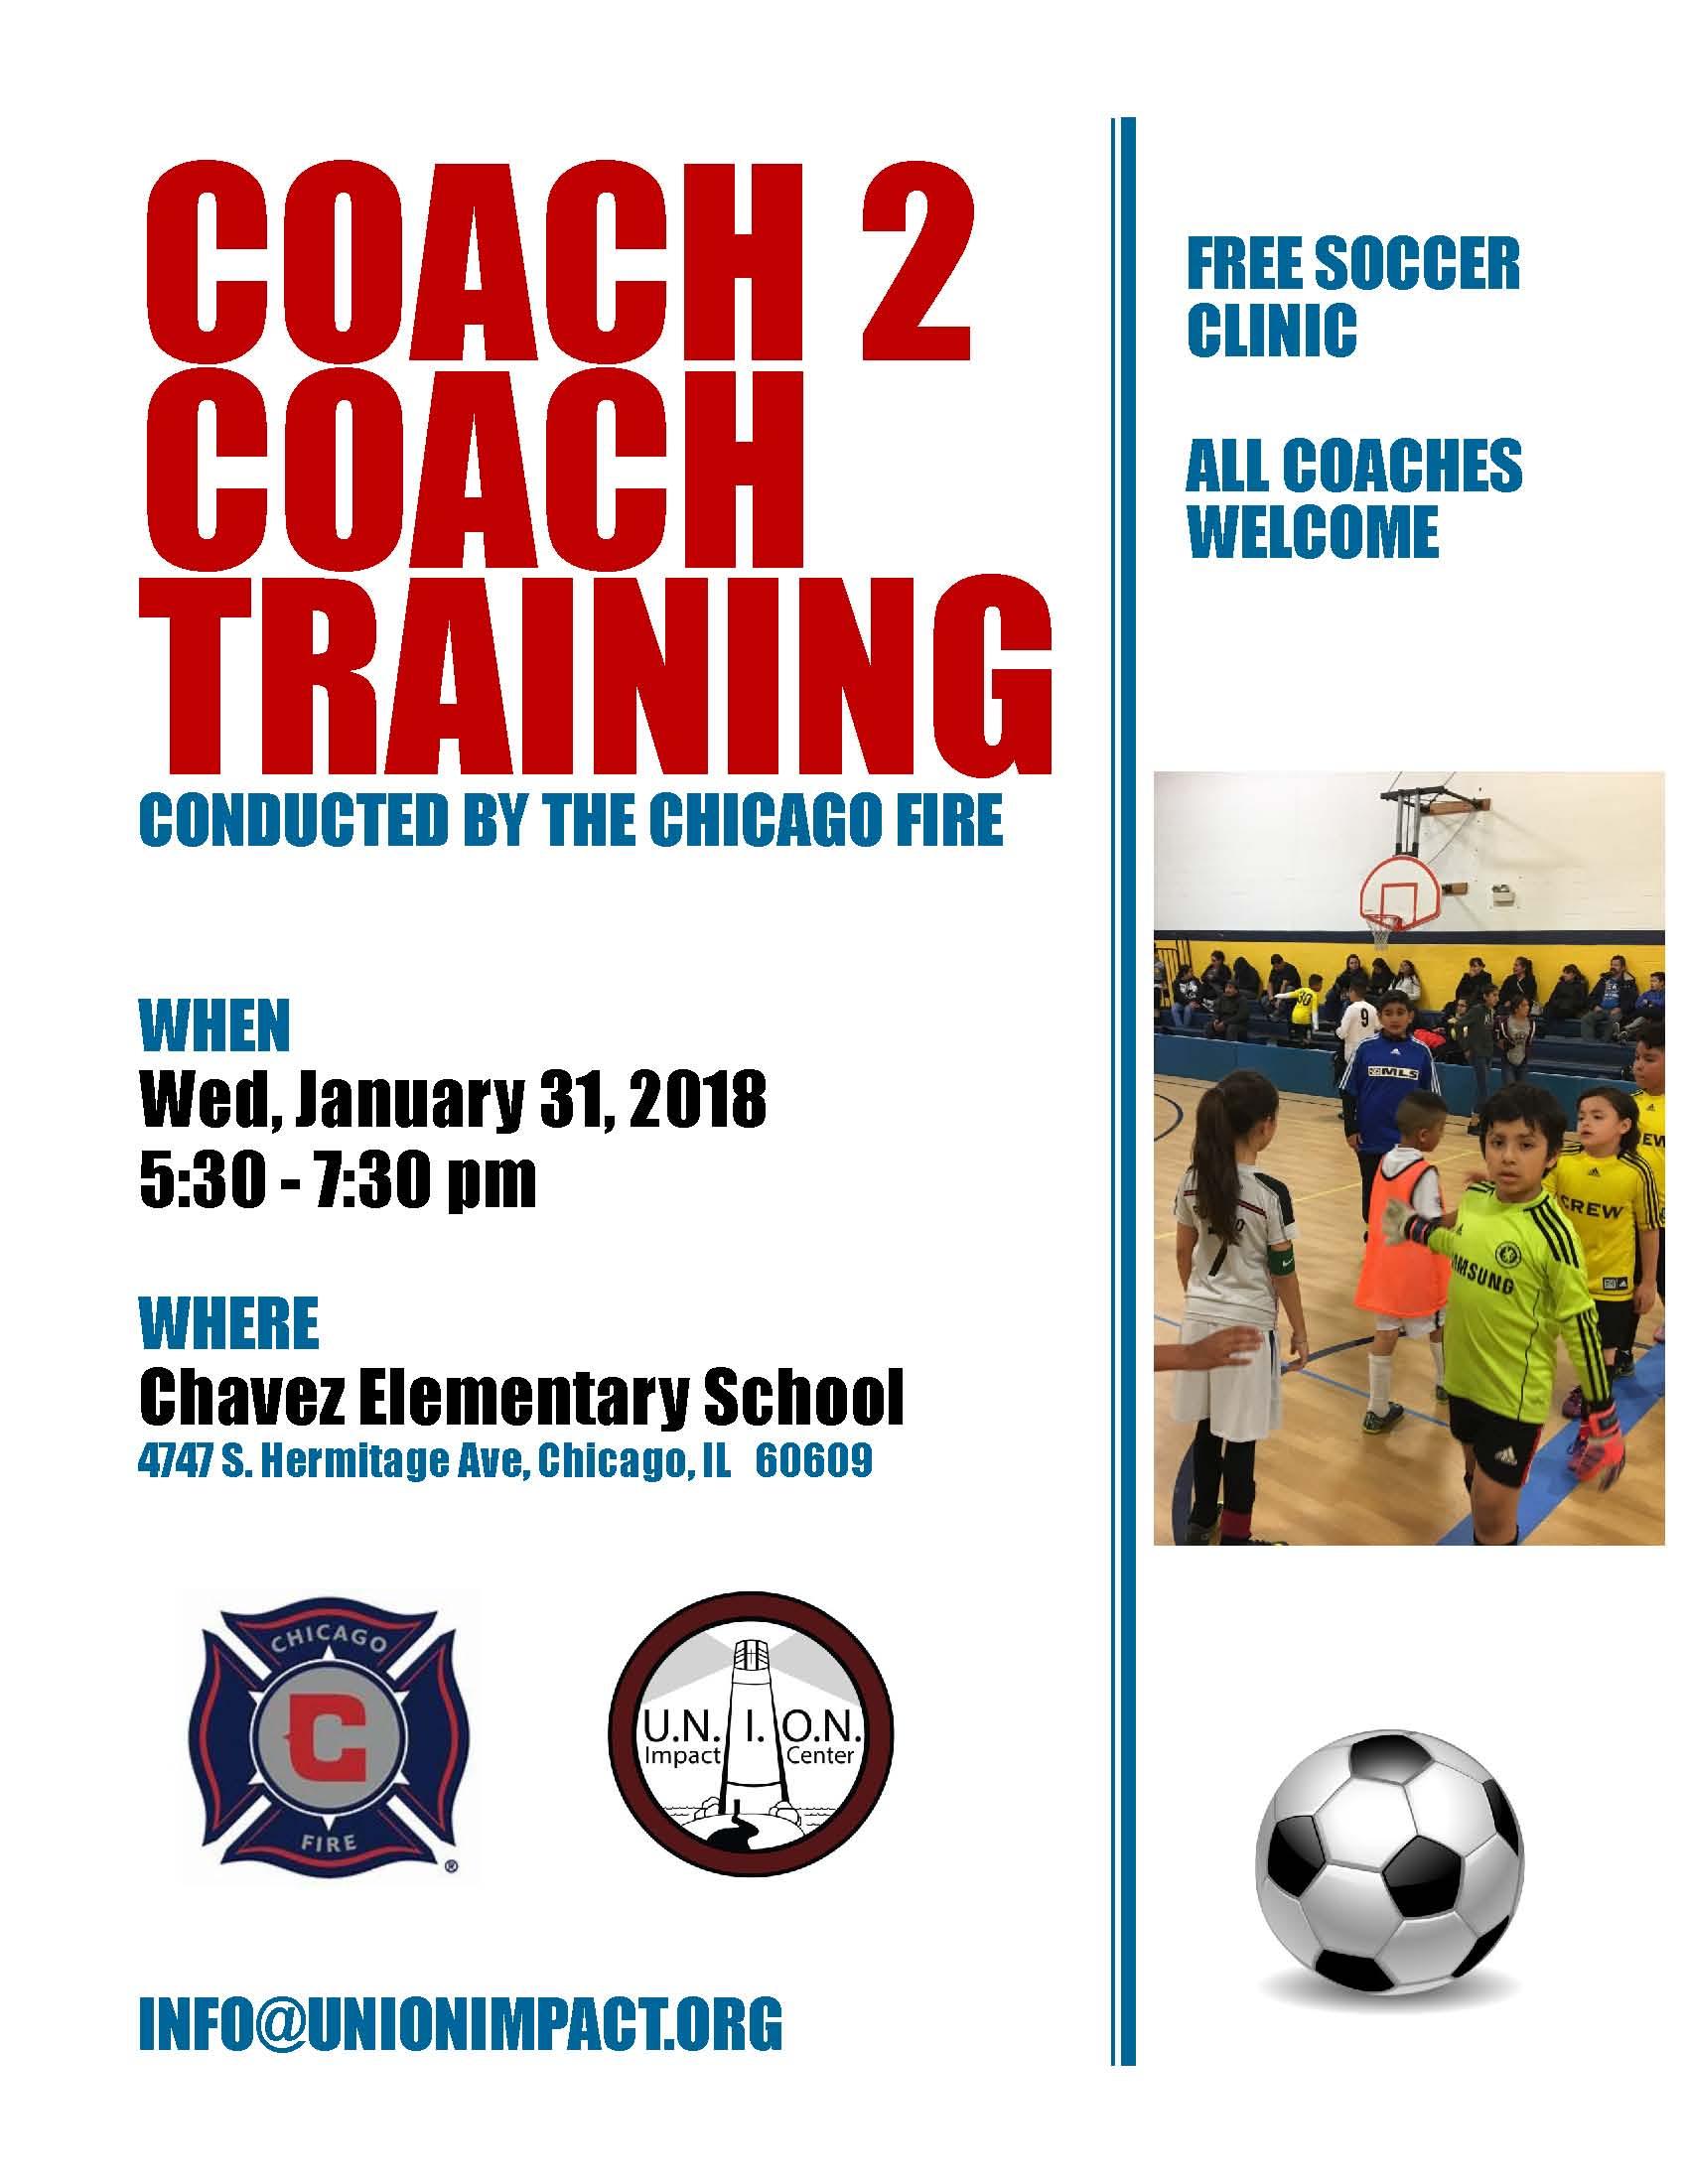 Coach Training Chicago Fire 1.31.18 - Draft 2.jpg